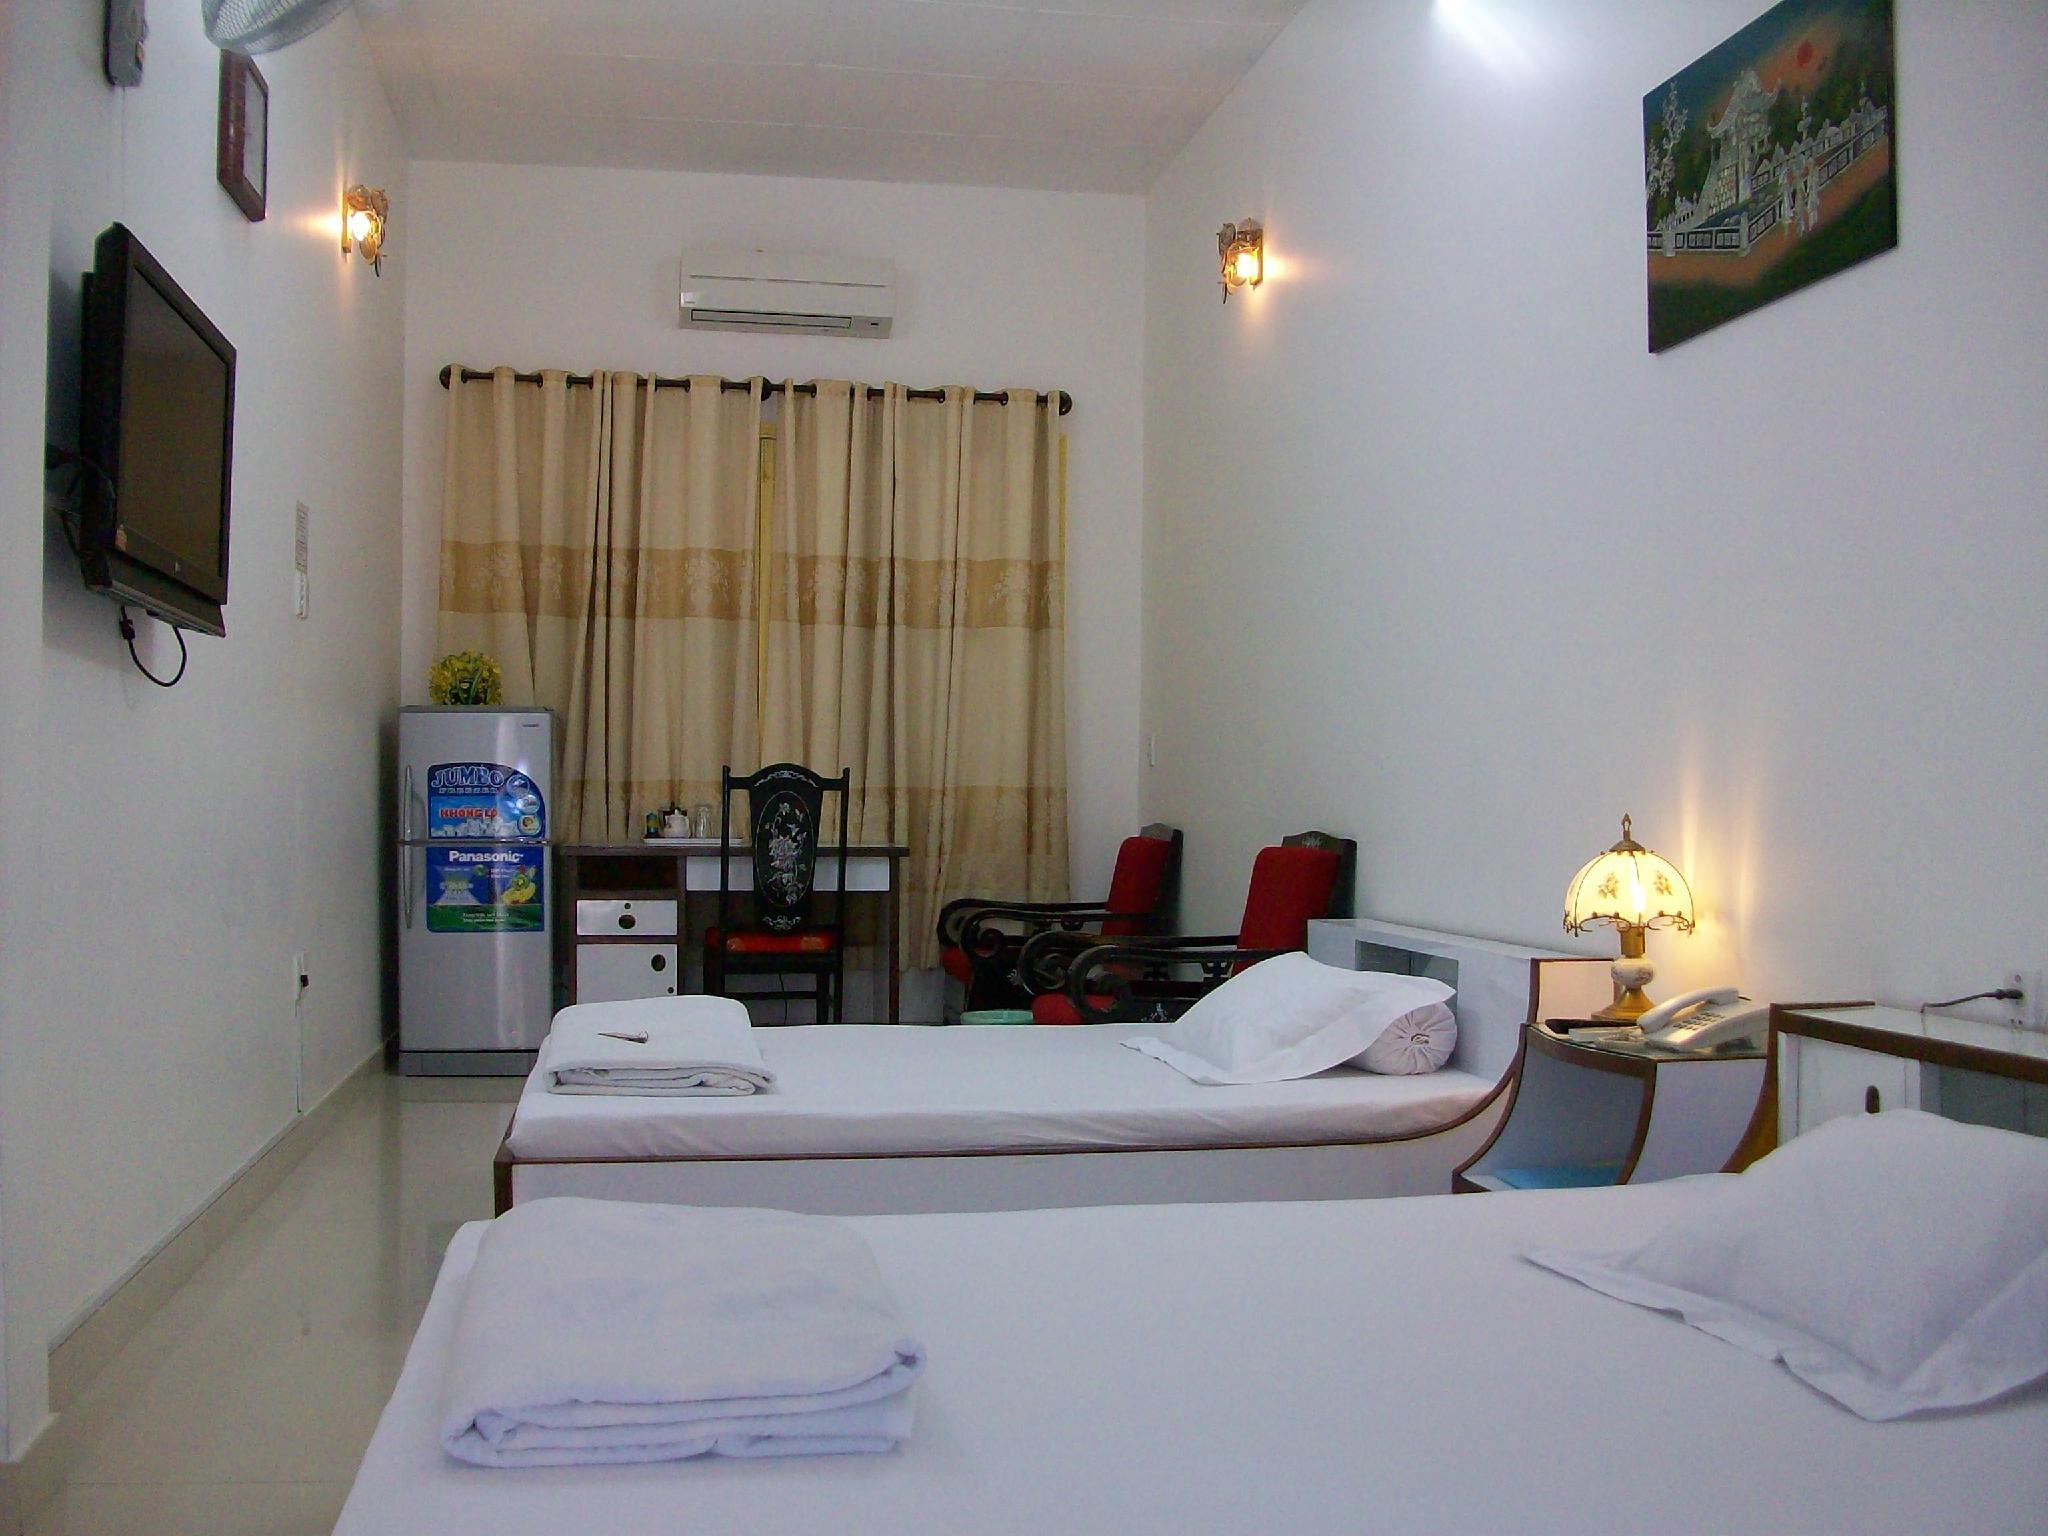 Phuong Anh Hotel Saigon - Hotell och Boende i Vietnam , Ho Chi Minh City